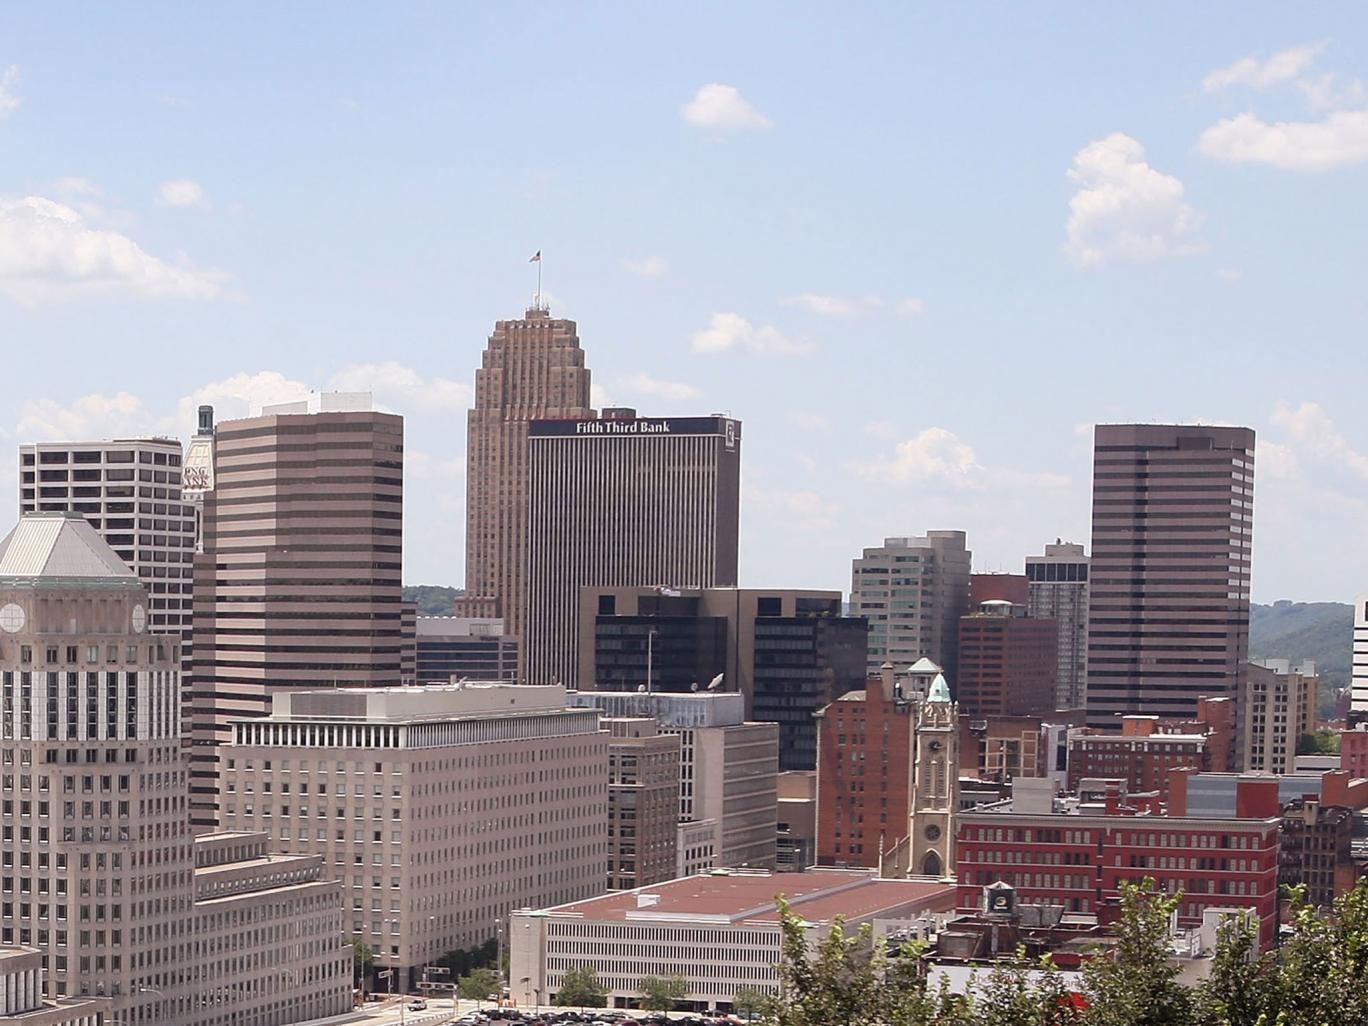 The skyline of Cincinnati, where the shooting took place